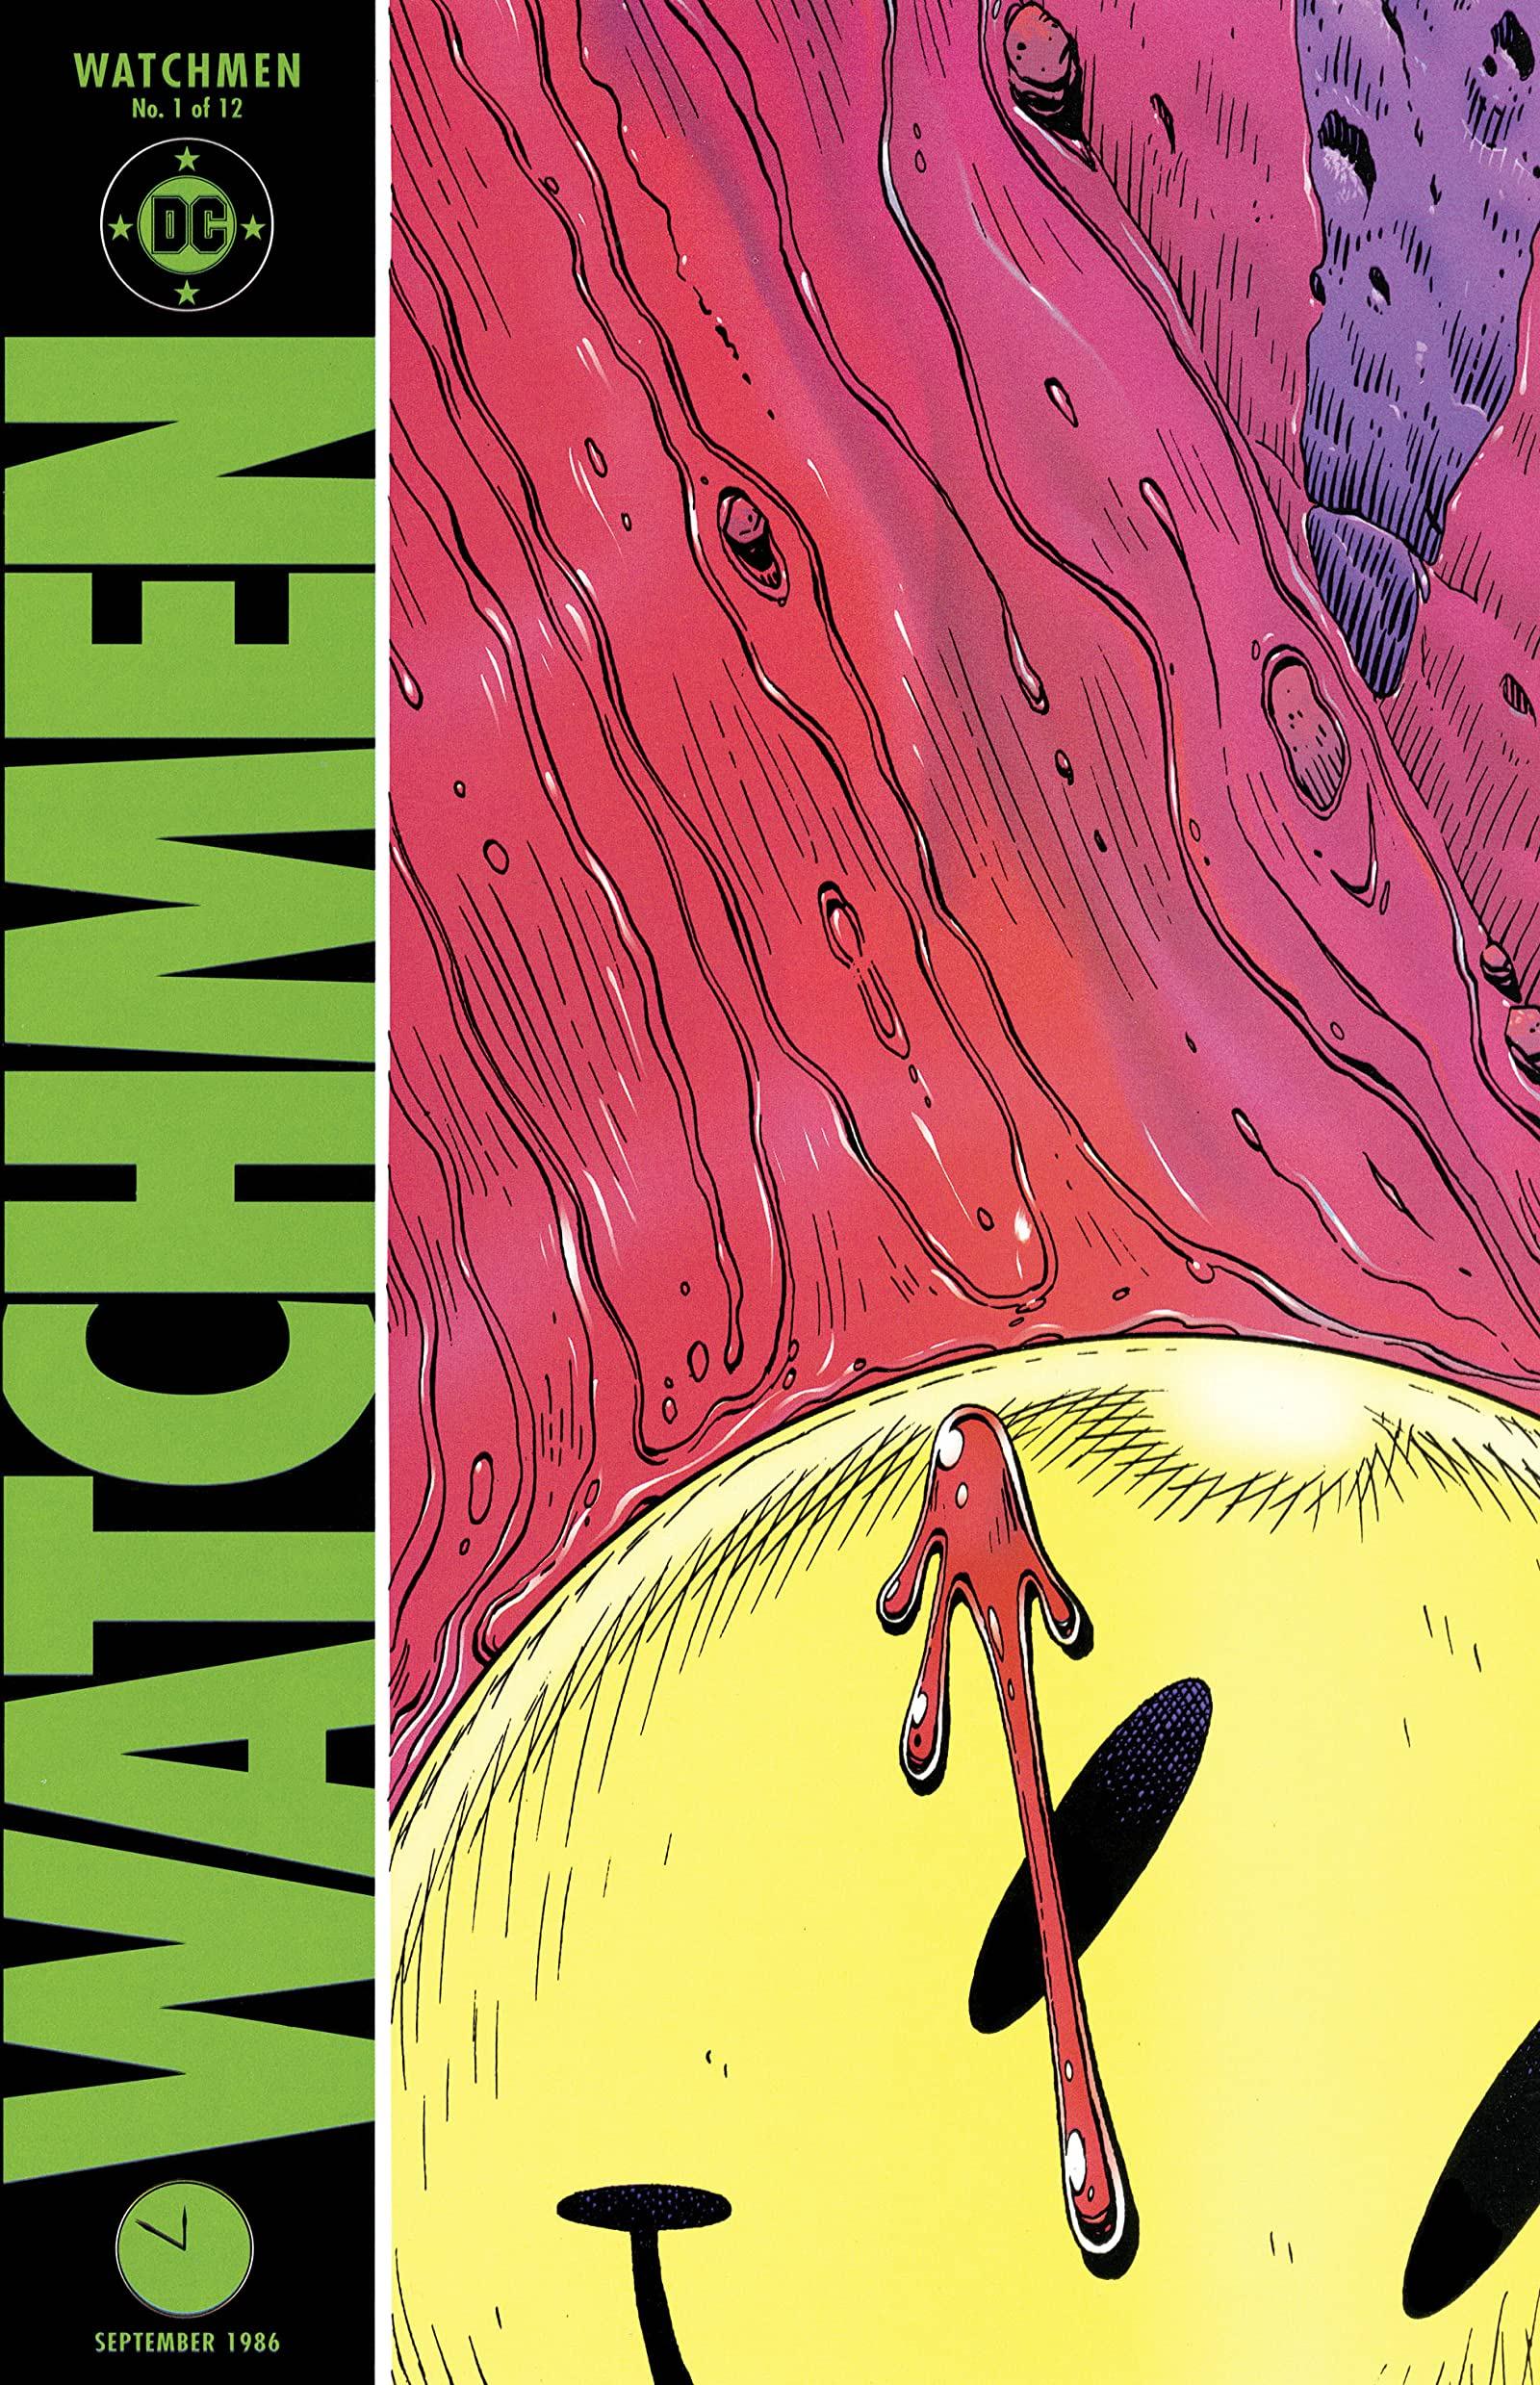 EXCELSIOR !!!! : Episode 7 : Watchmen